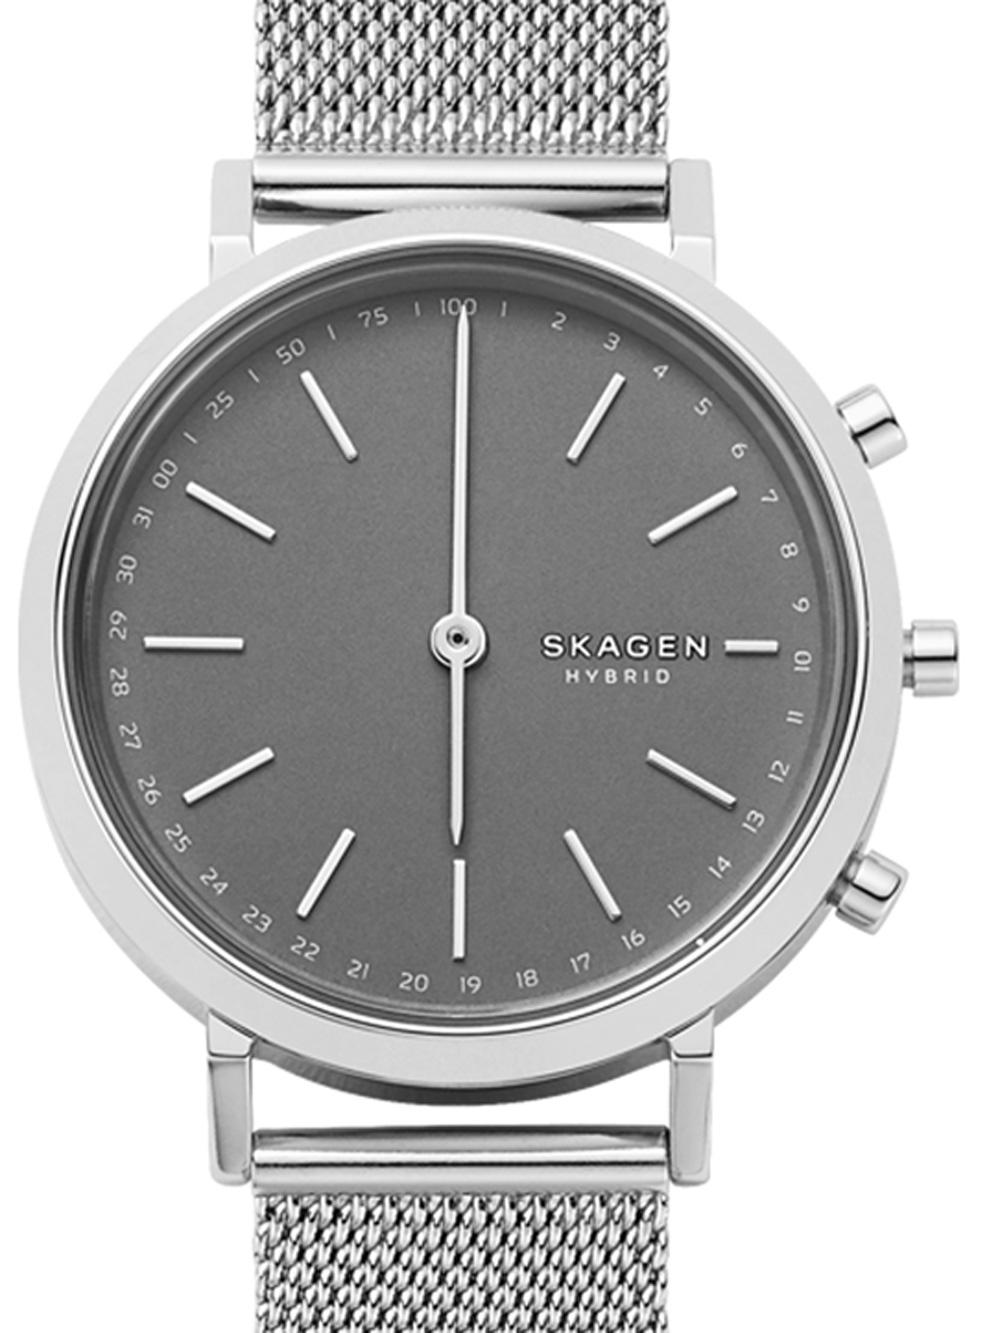 Skagen SKT1409 Hald Hybrid Smartwatch Damen 34mm 3ATM